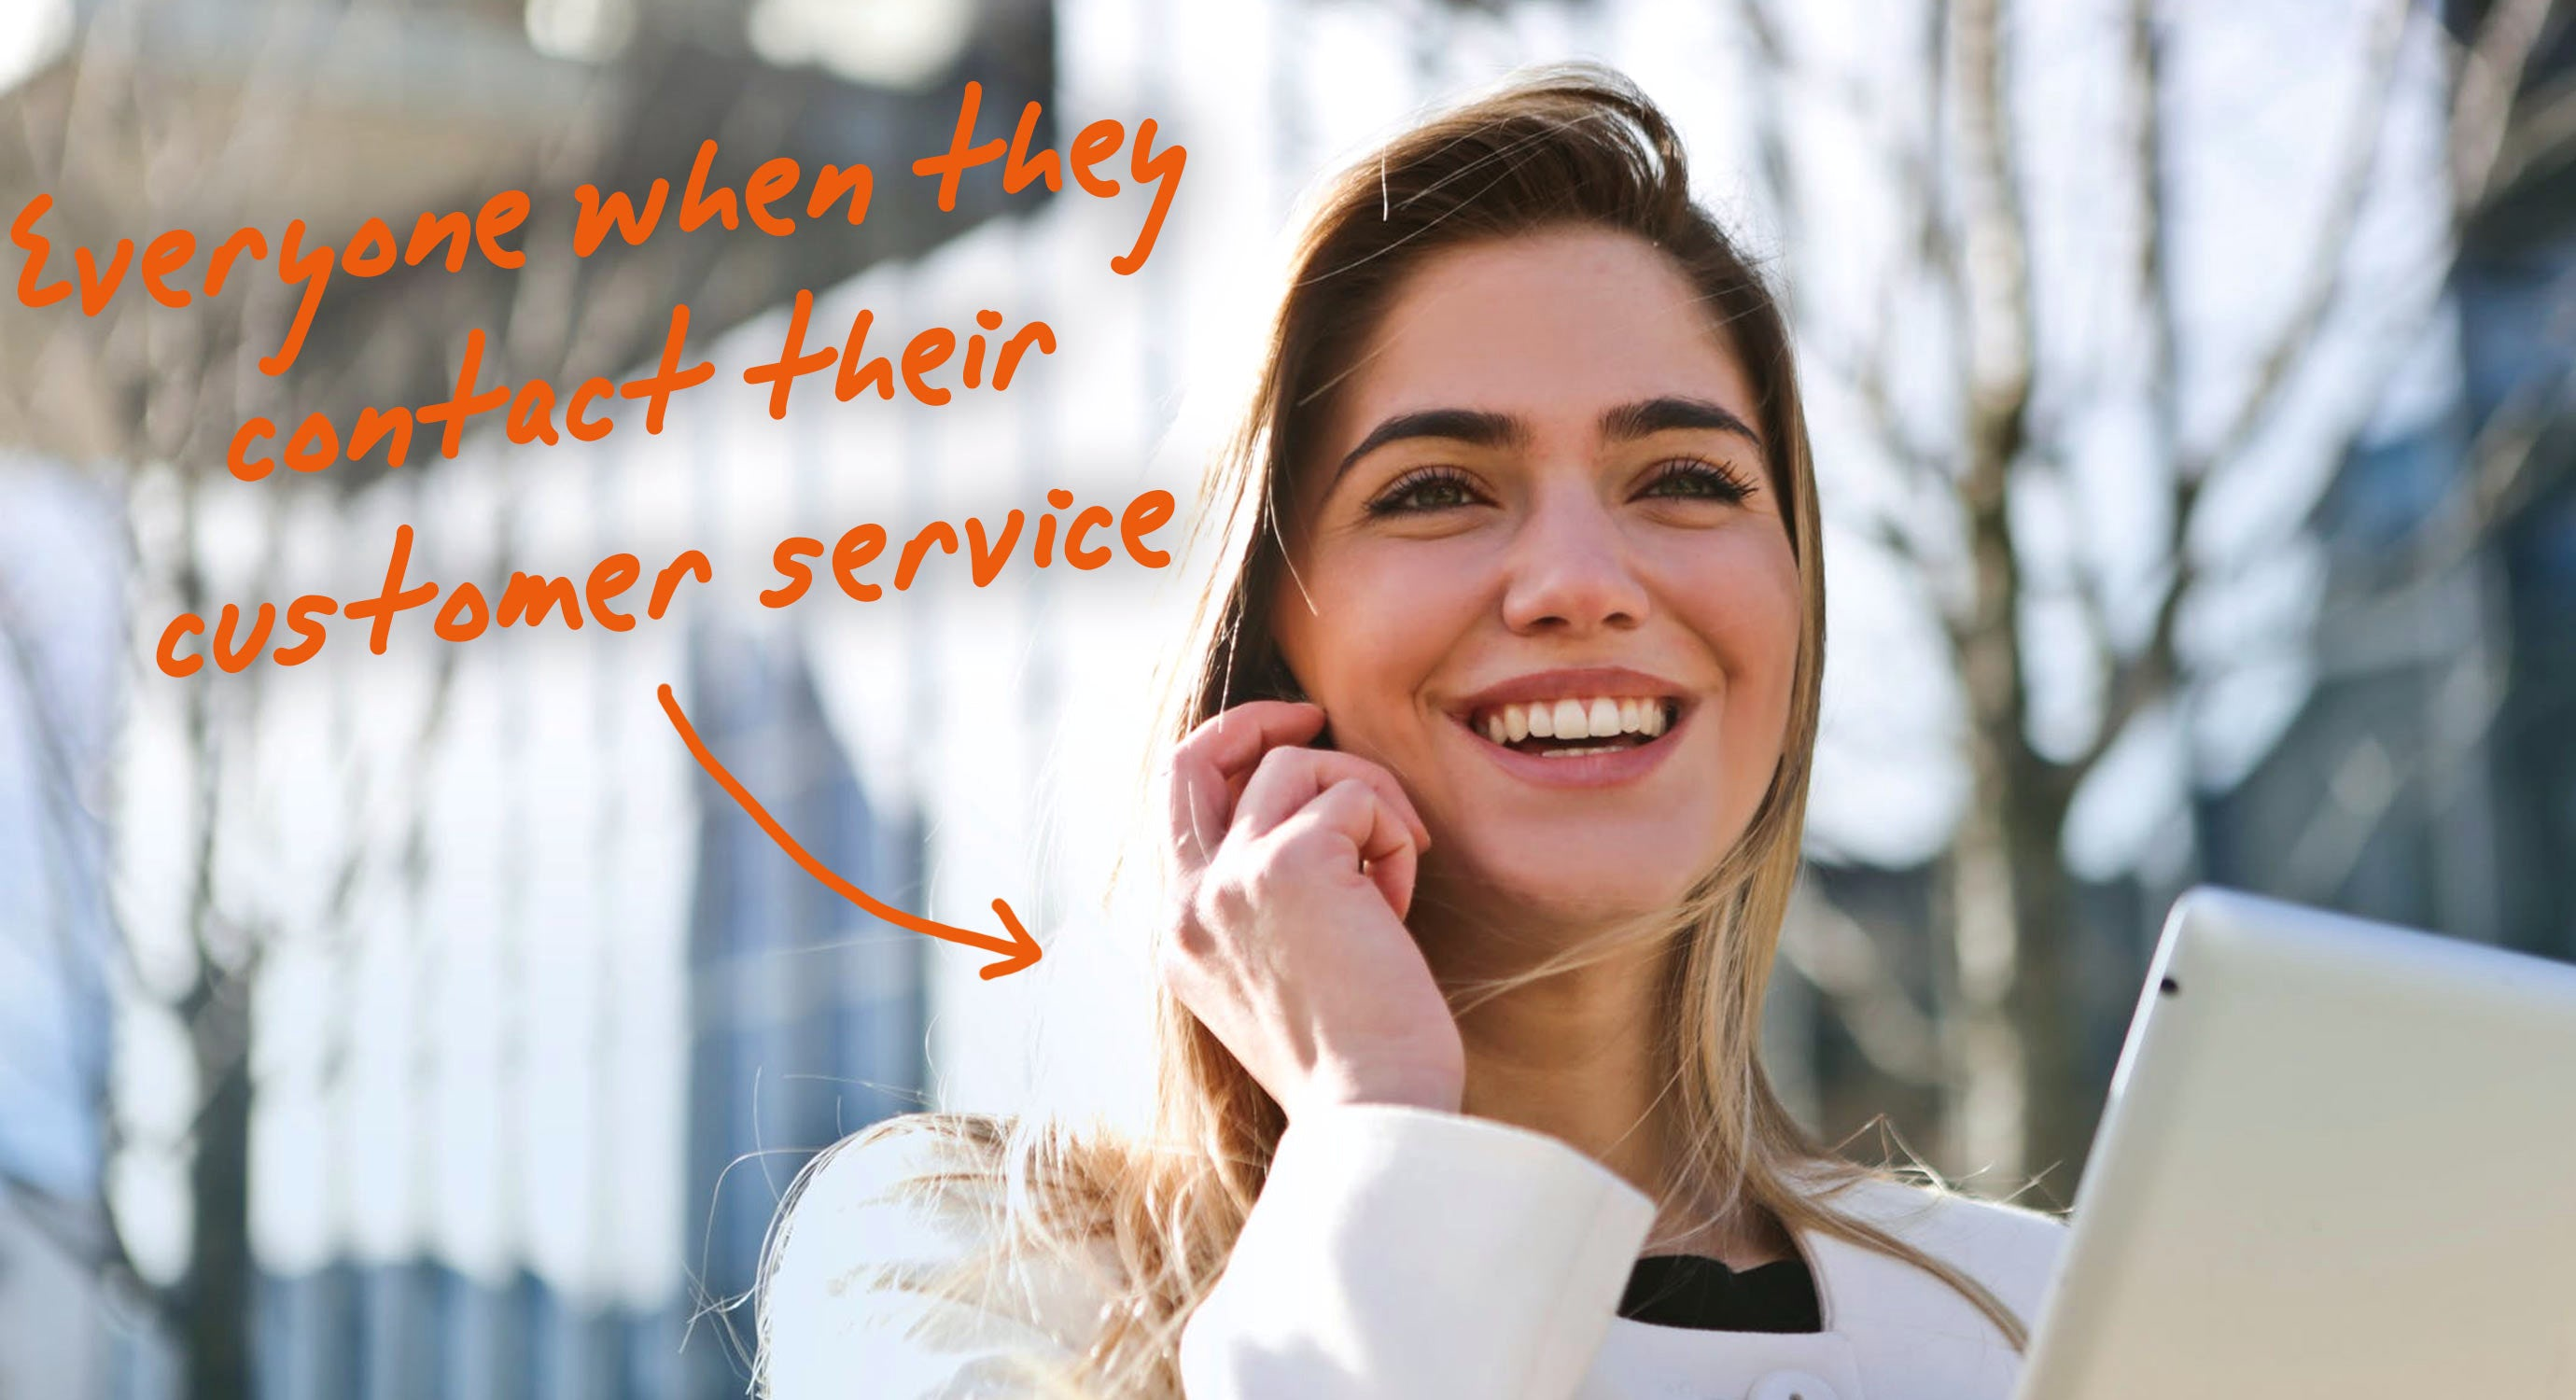 someone on the phone enjoying the customer service